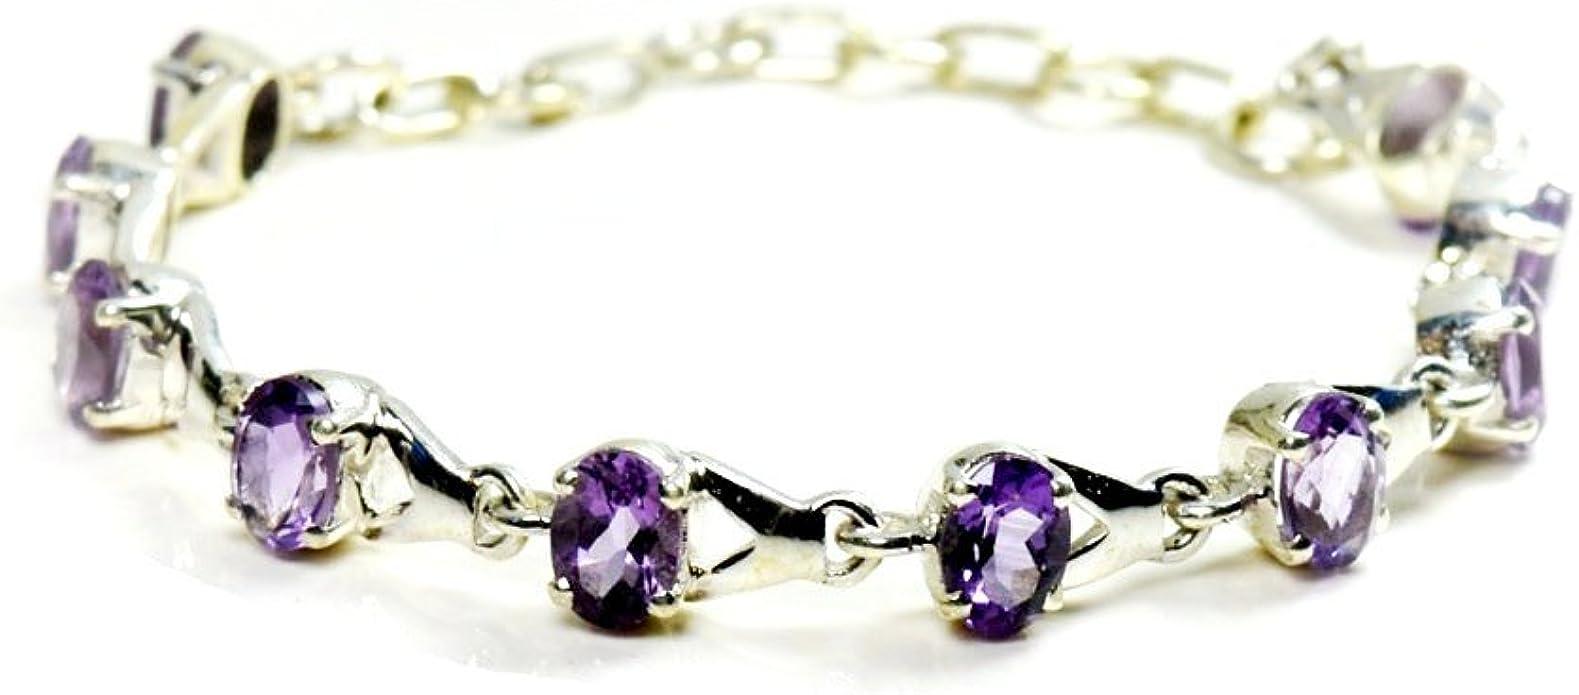 cut amethyst bracelet amethyst bracelet-amethyst silver bracelet-amethyst stone bracelet birth stone bracelet